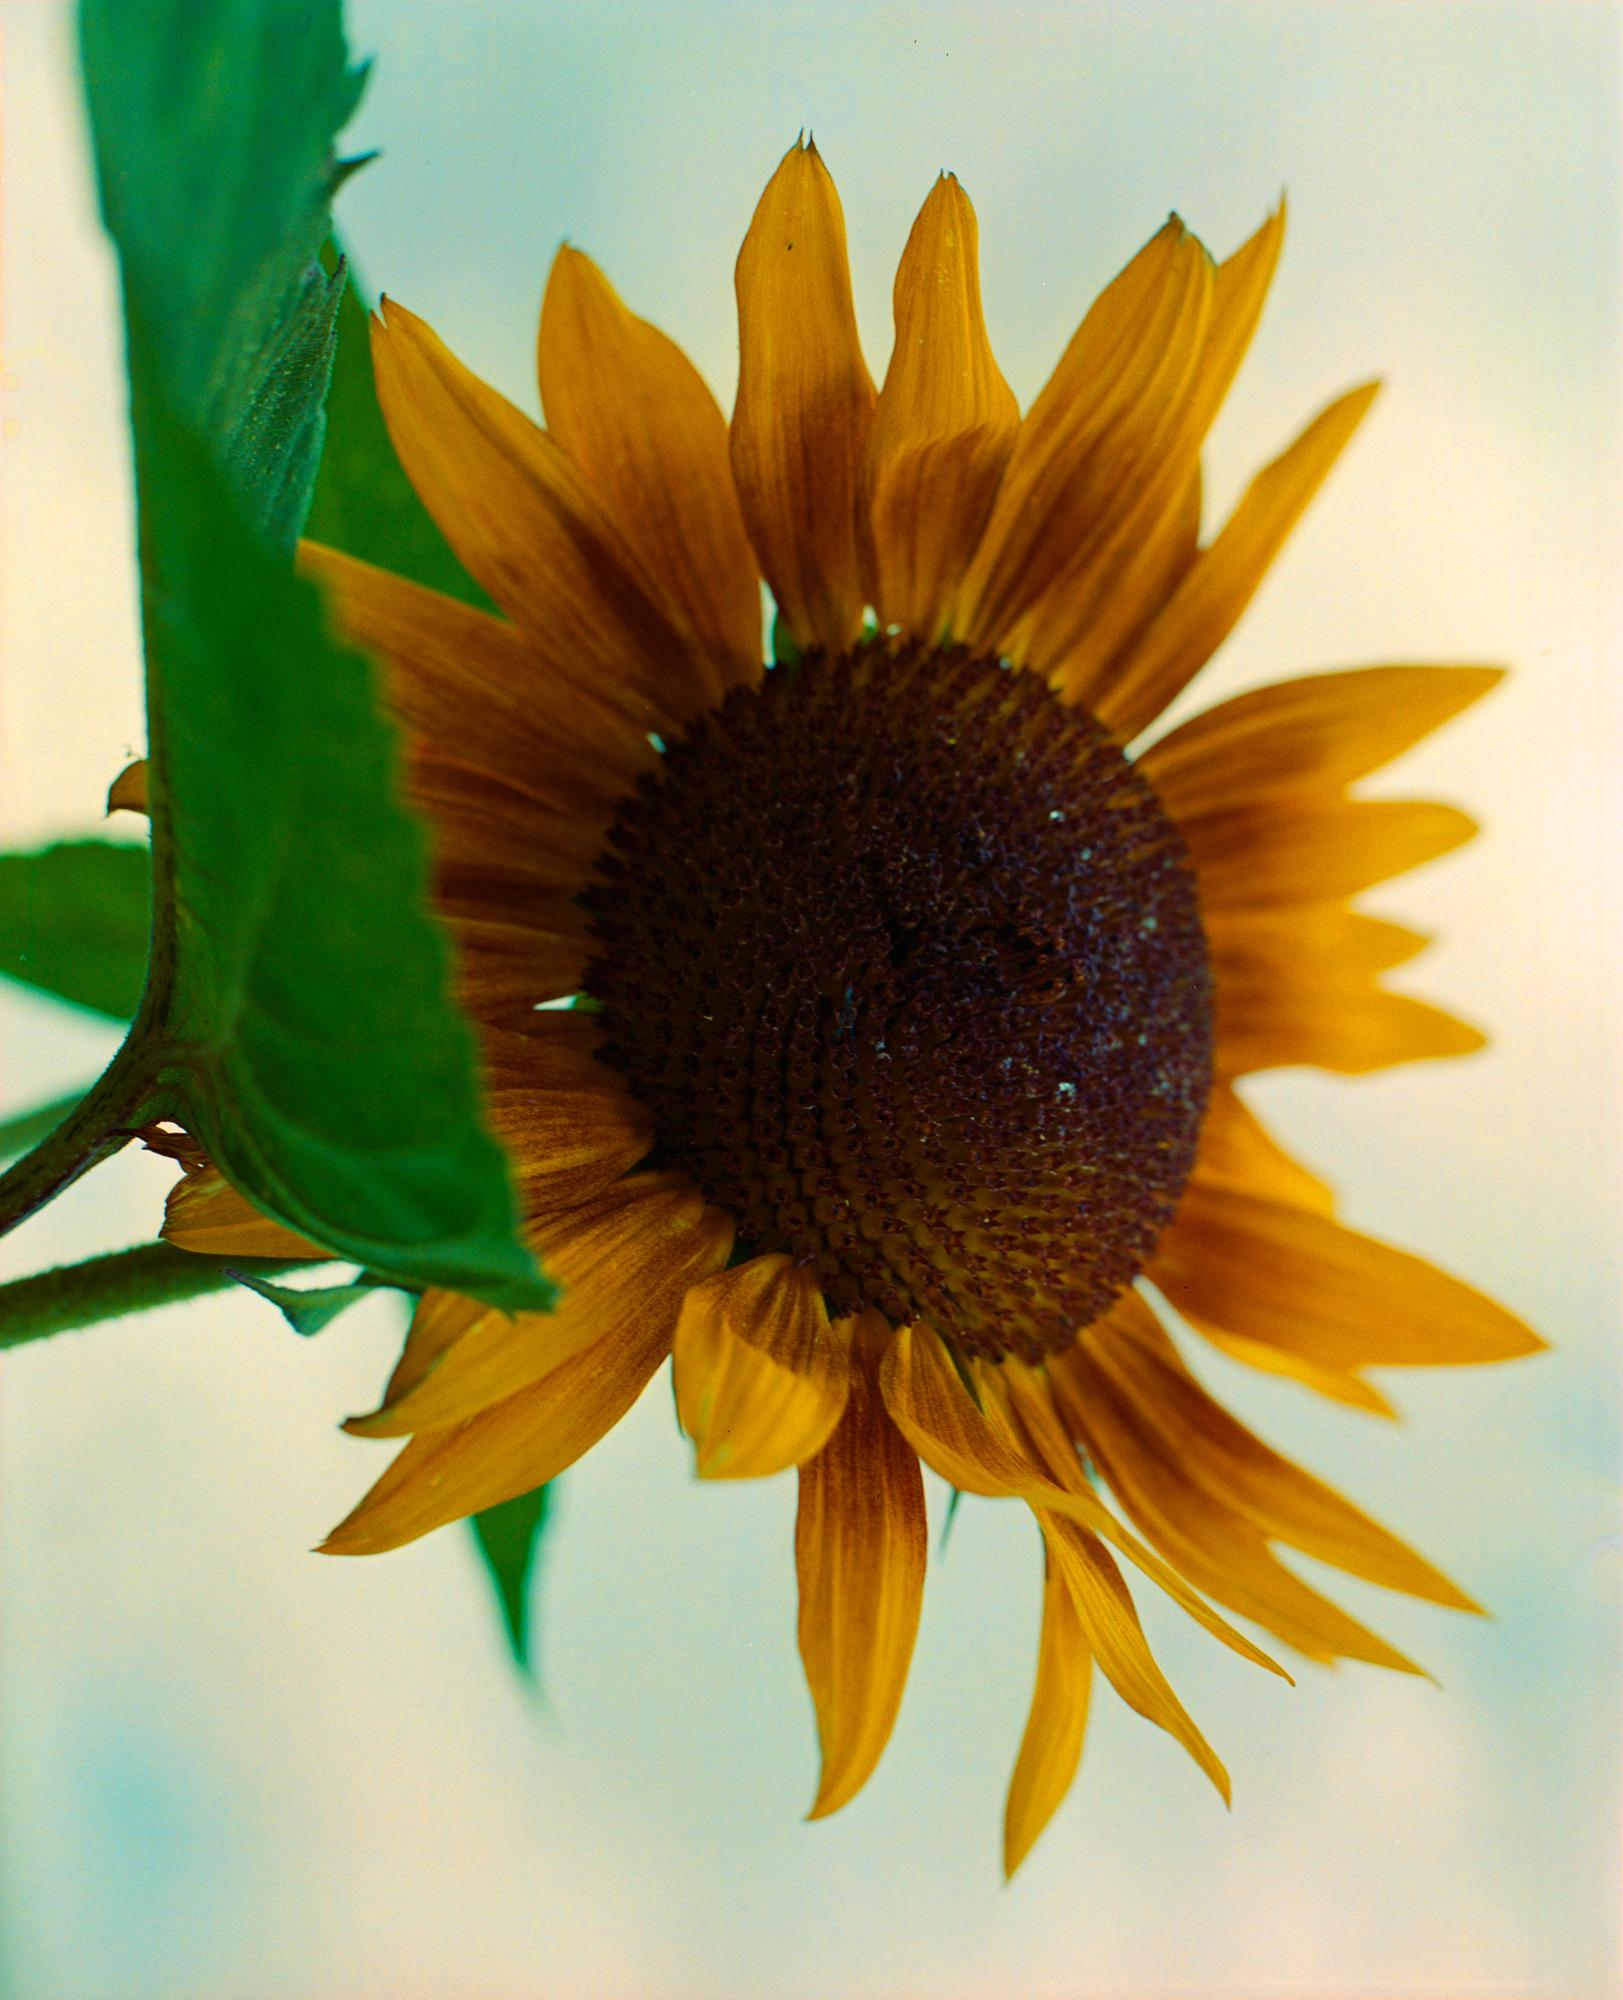 Sunflower, Photography By Ioannis Koussertari